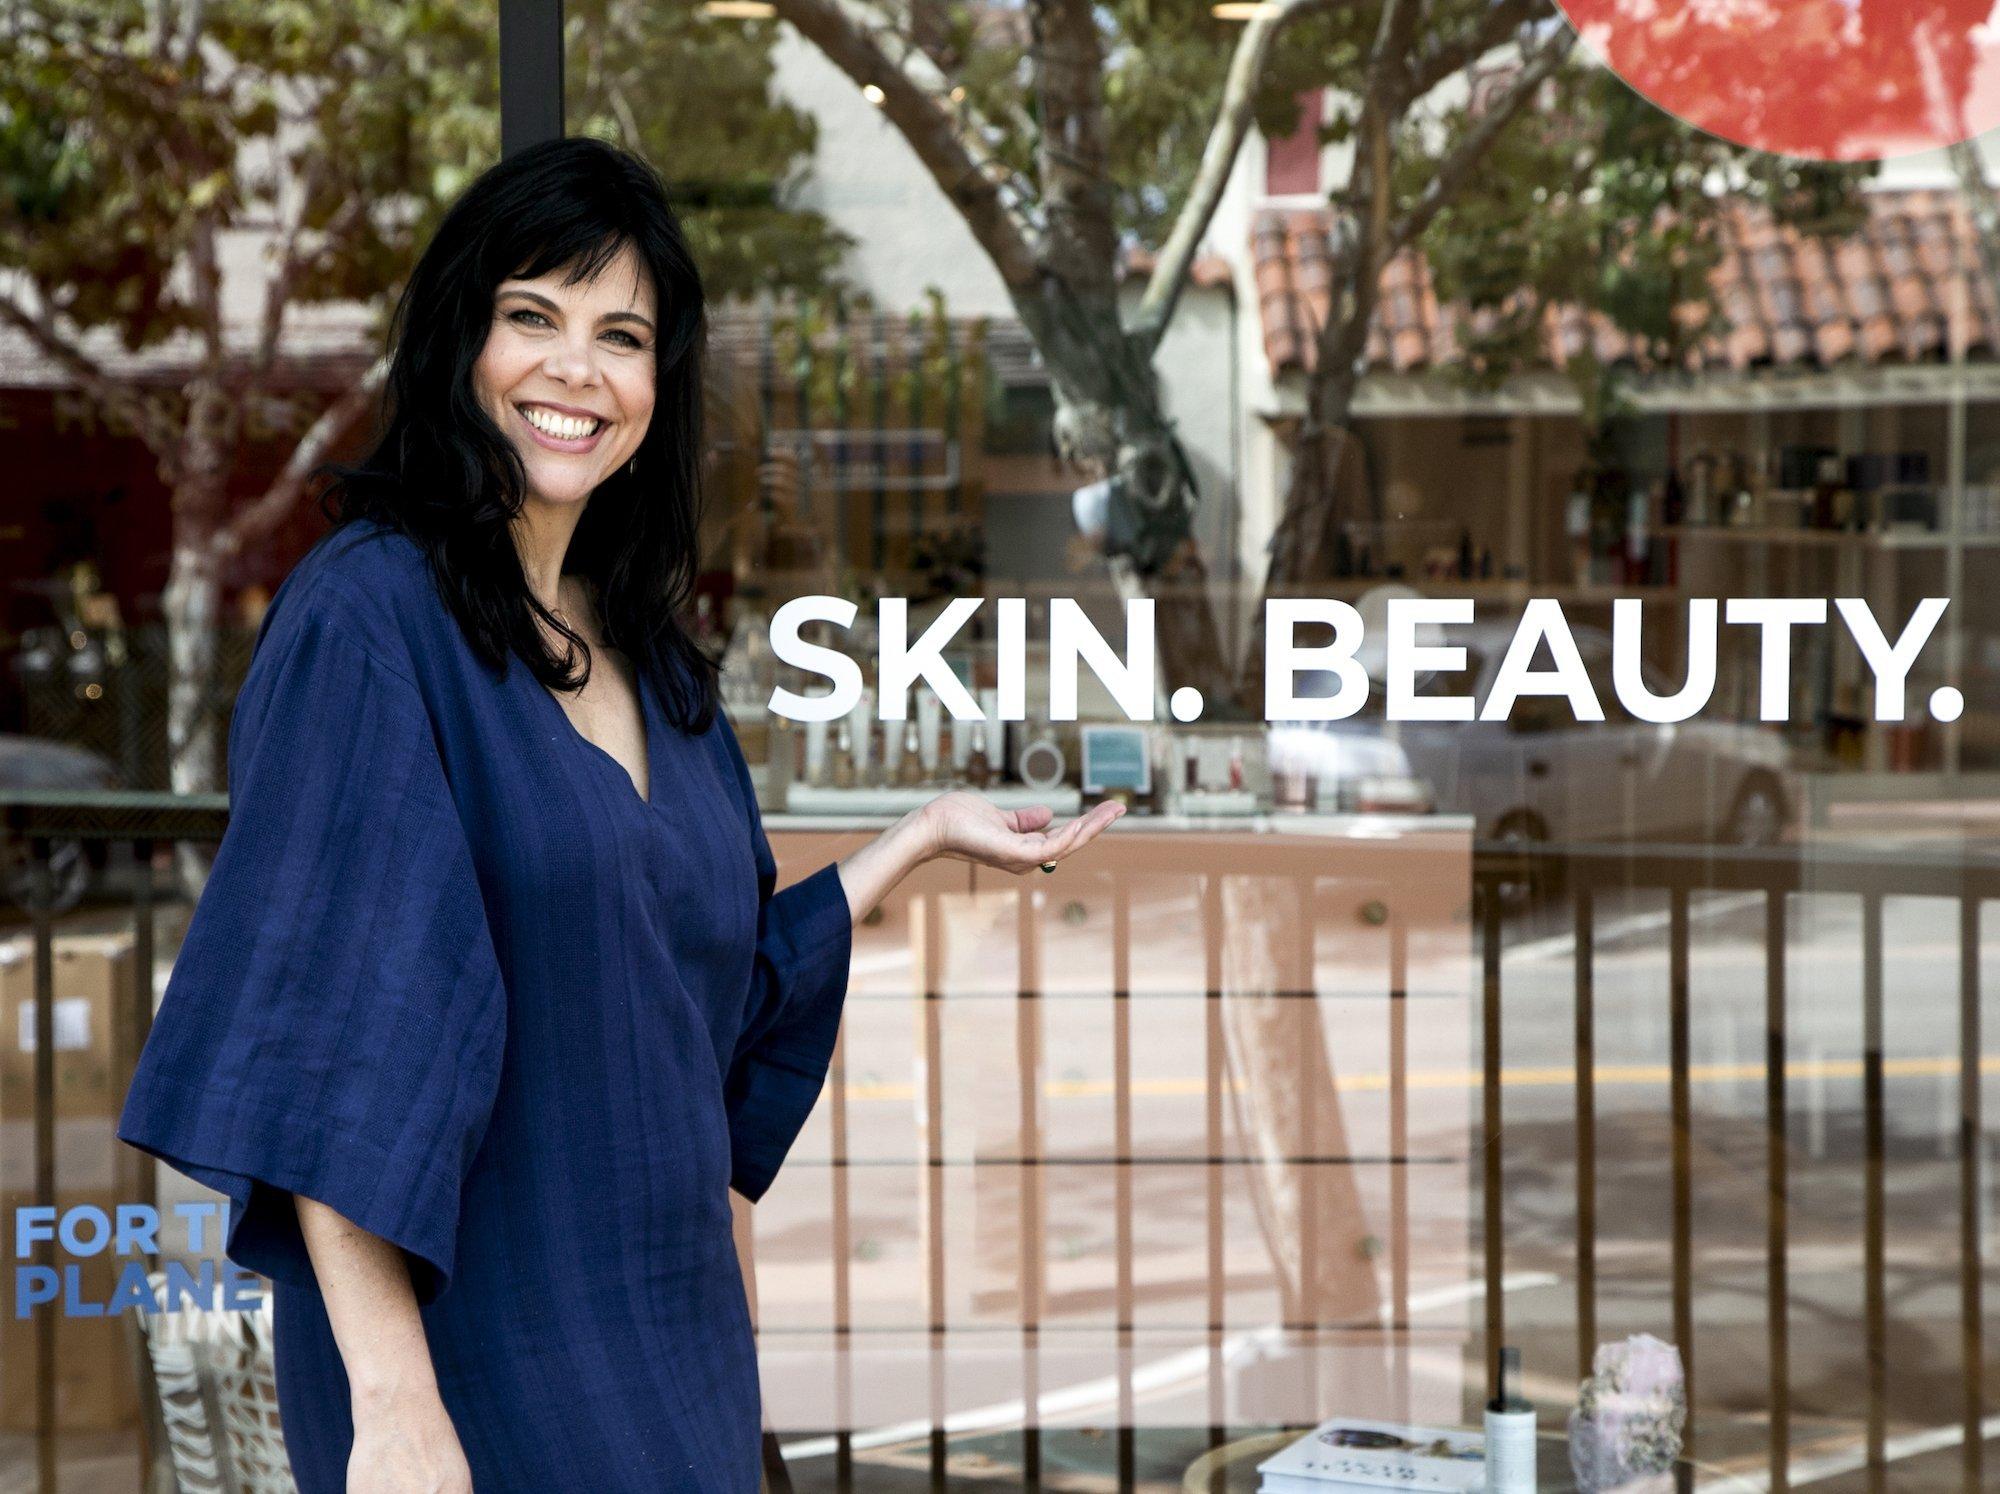 Beauty Heroes founder Jeannie Jarnot